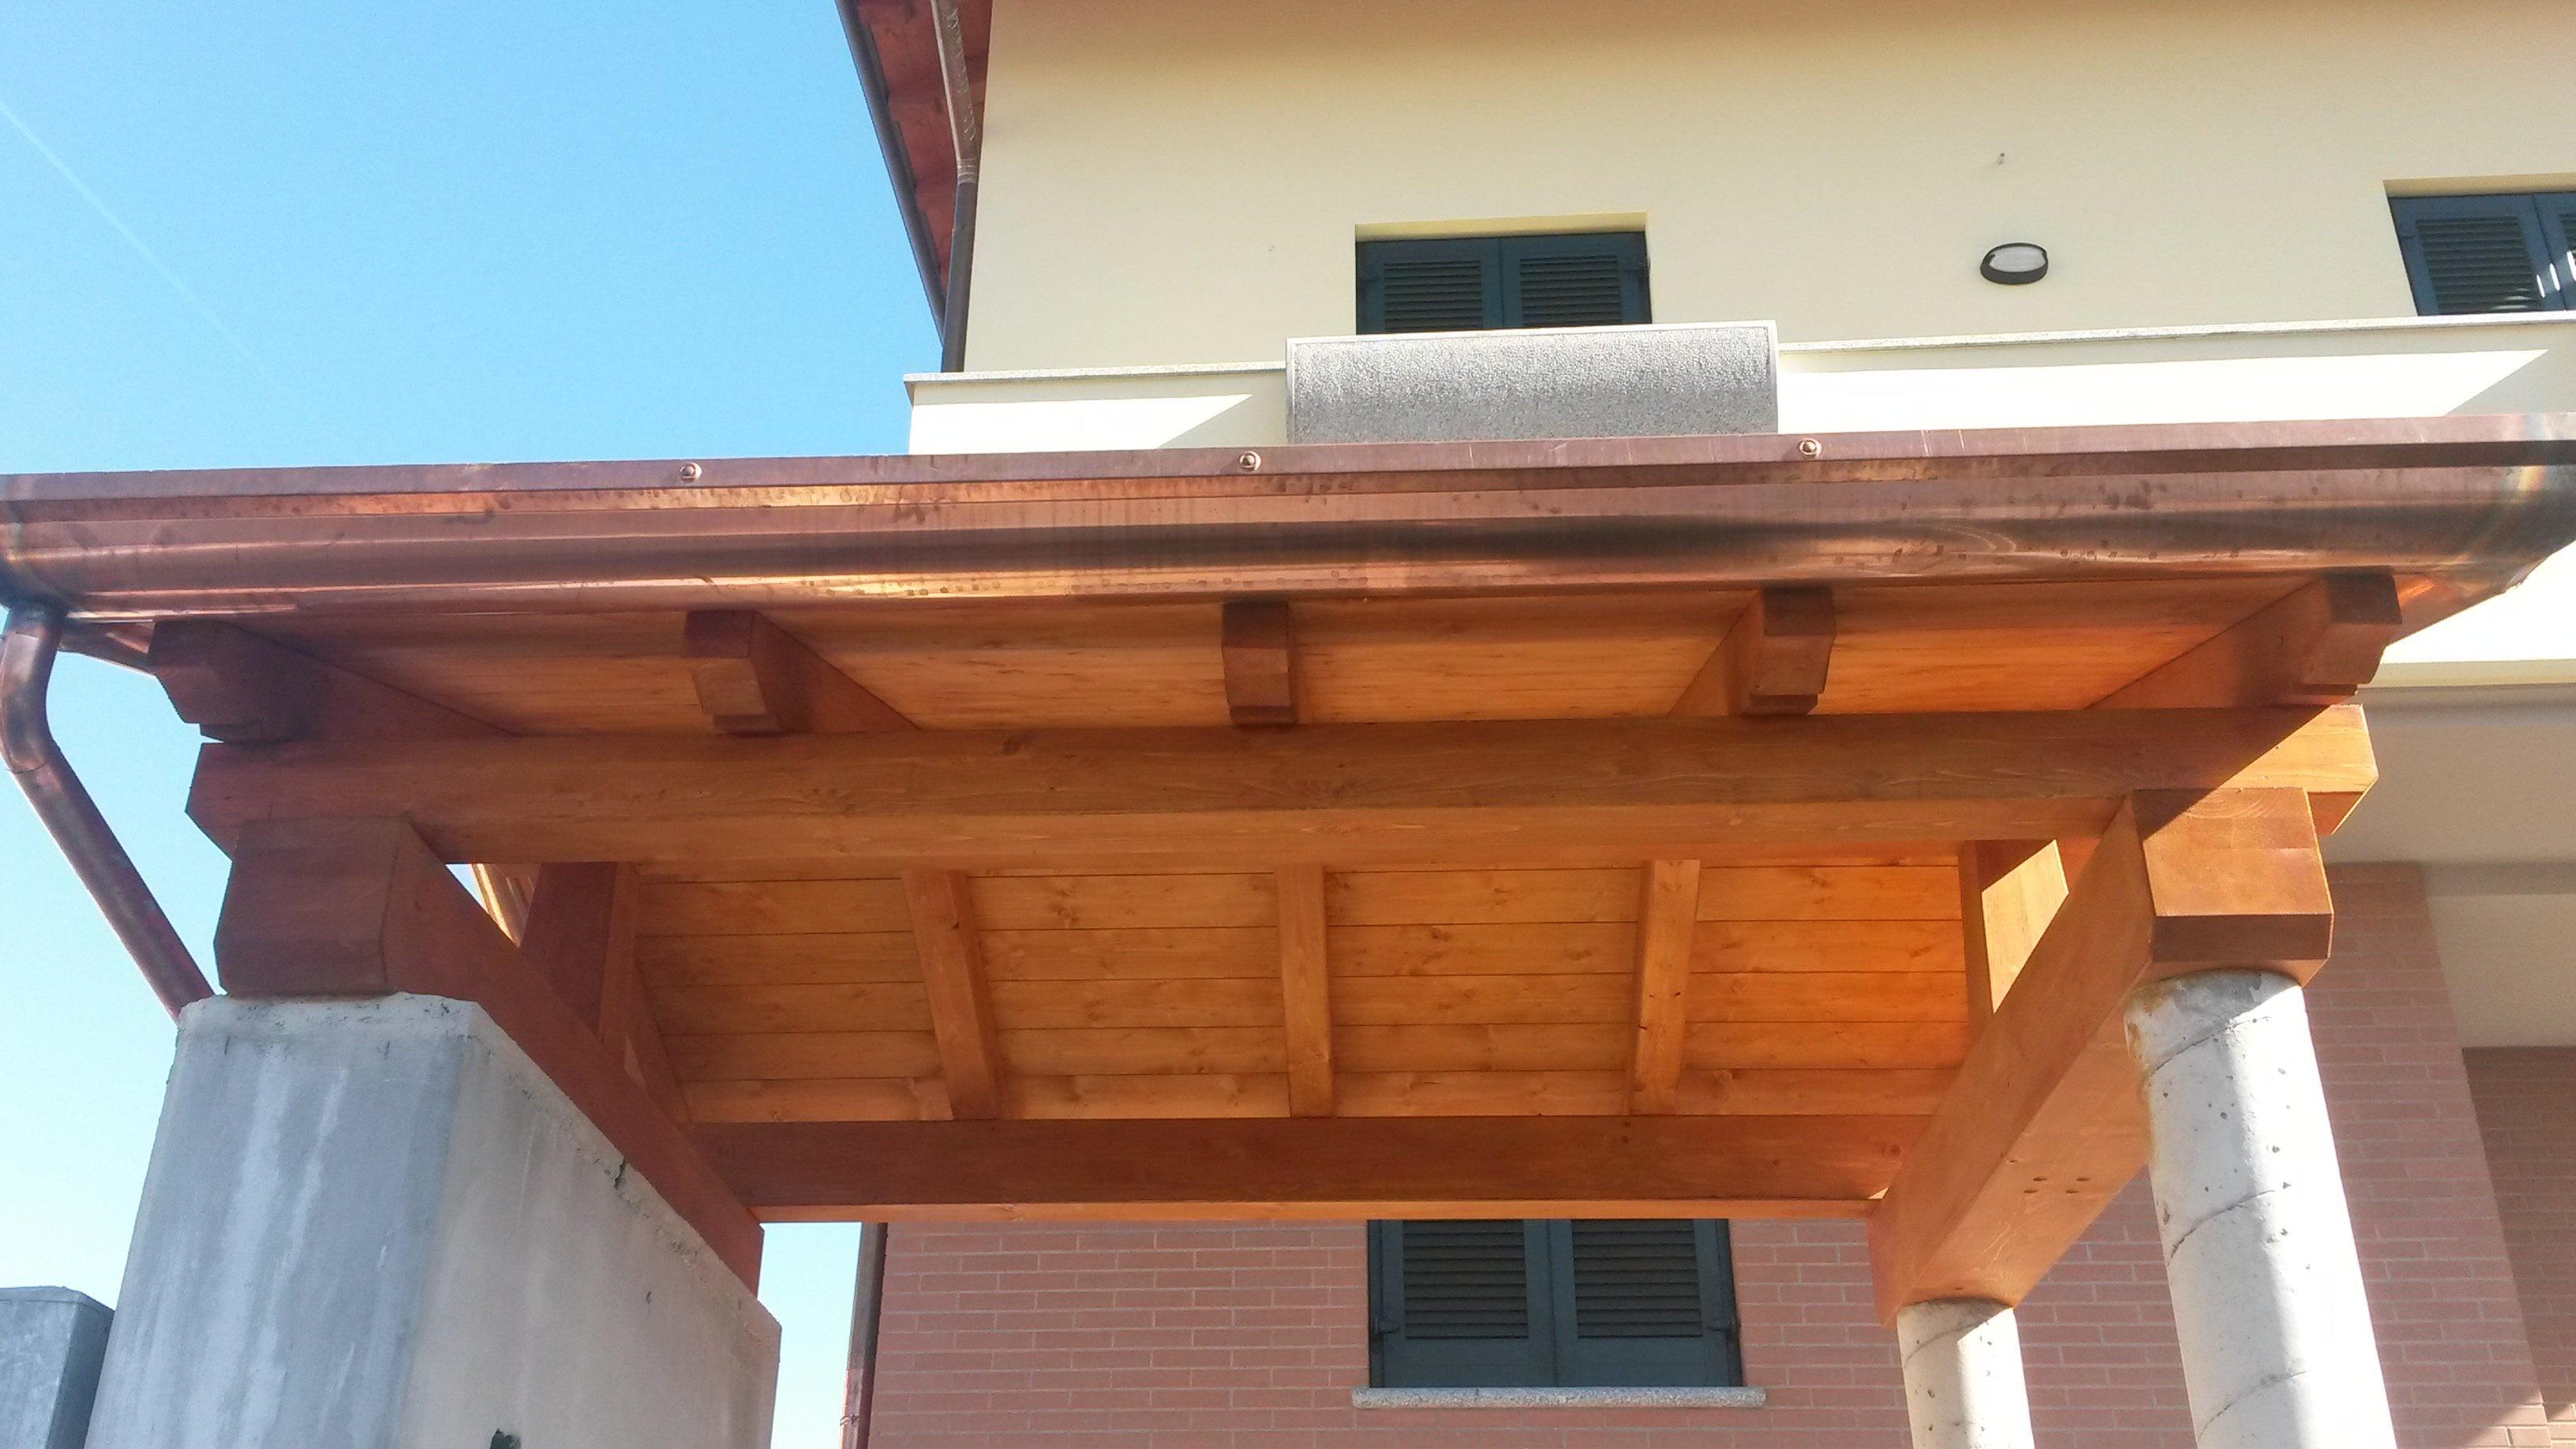 Mobili lavelli tettoia per ingresso casa - Pensiline ingresso casa ...